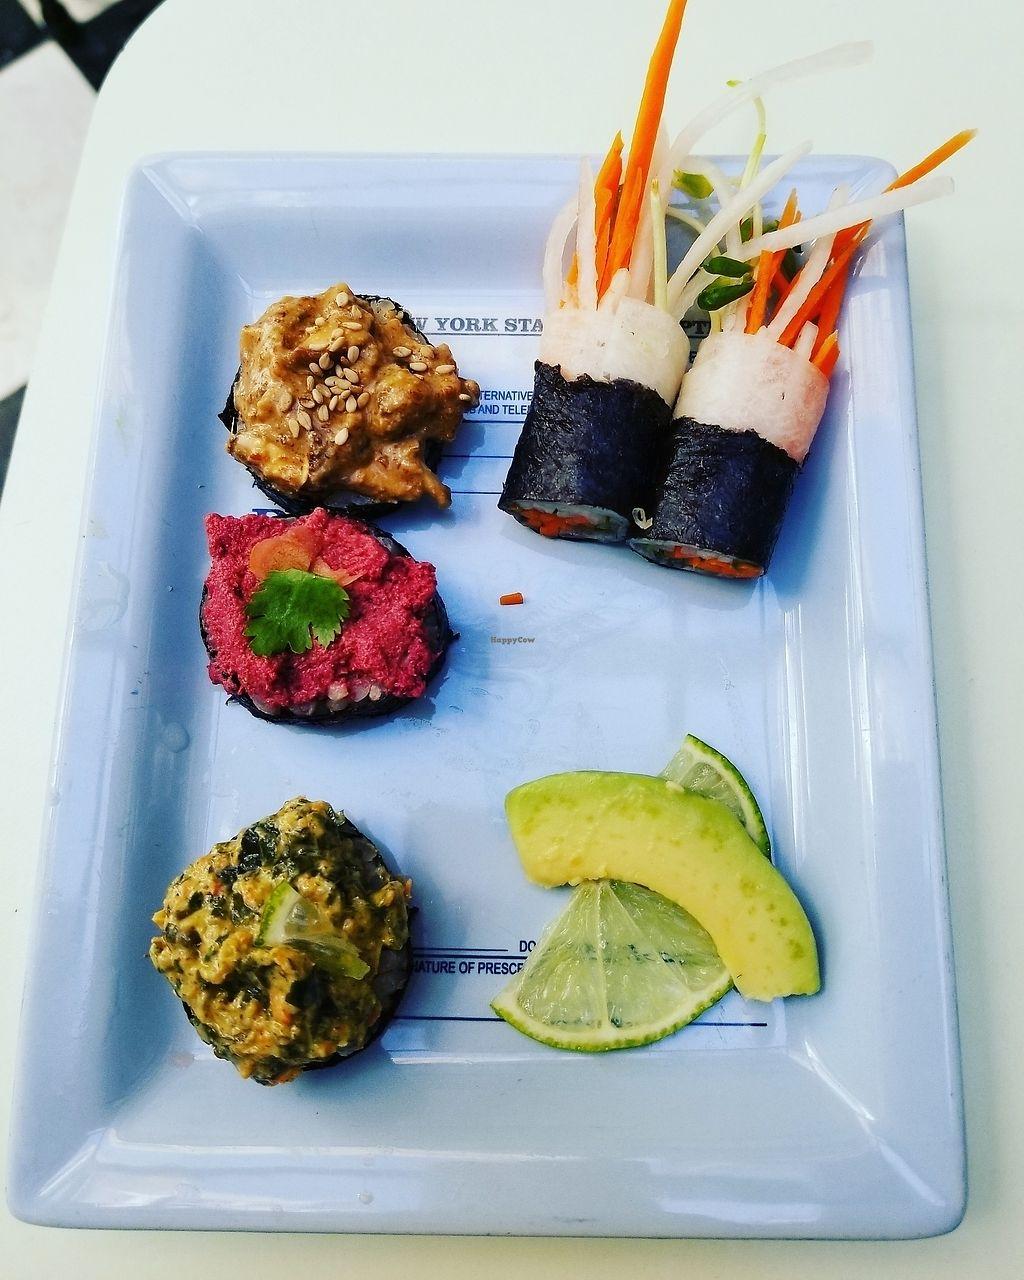 "Photo of Le Botaniste  by <a href=""/members/profile/tikhonova87"">tikhonova87</a> <br/>sushi plate <br/> July 30, 2017  - <a href='/contact/abuse/image/70277/286714'>Report</a>"